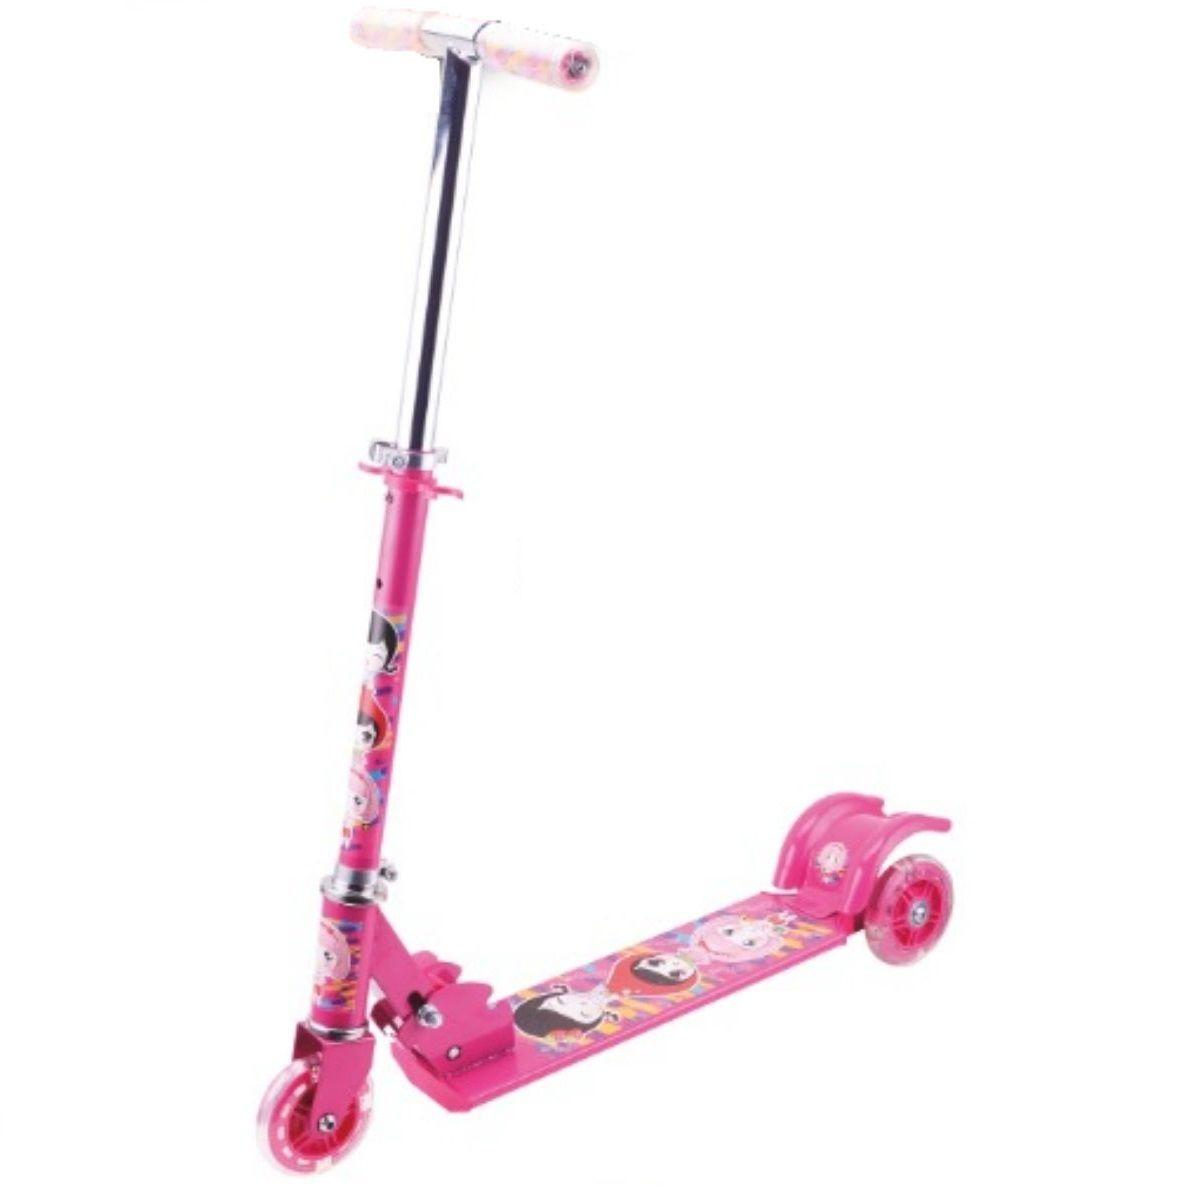 Patinete Infantil Para Meninas Rosa Com 3 Rodas - YTS-01RO-LX